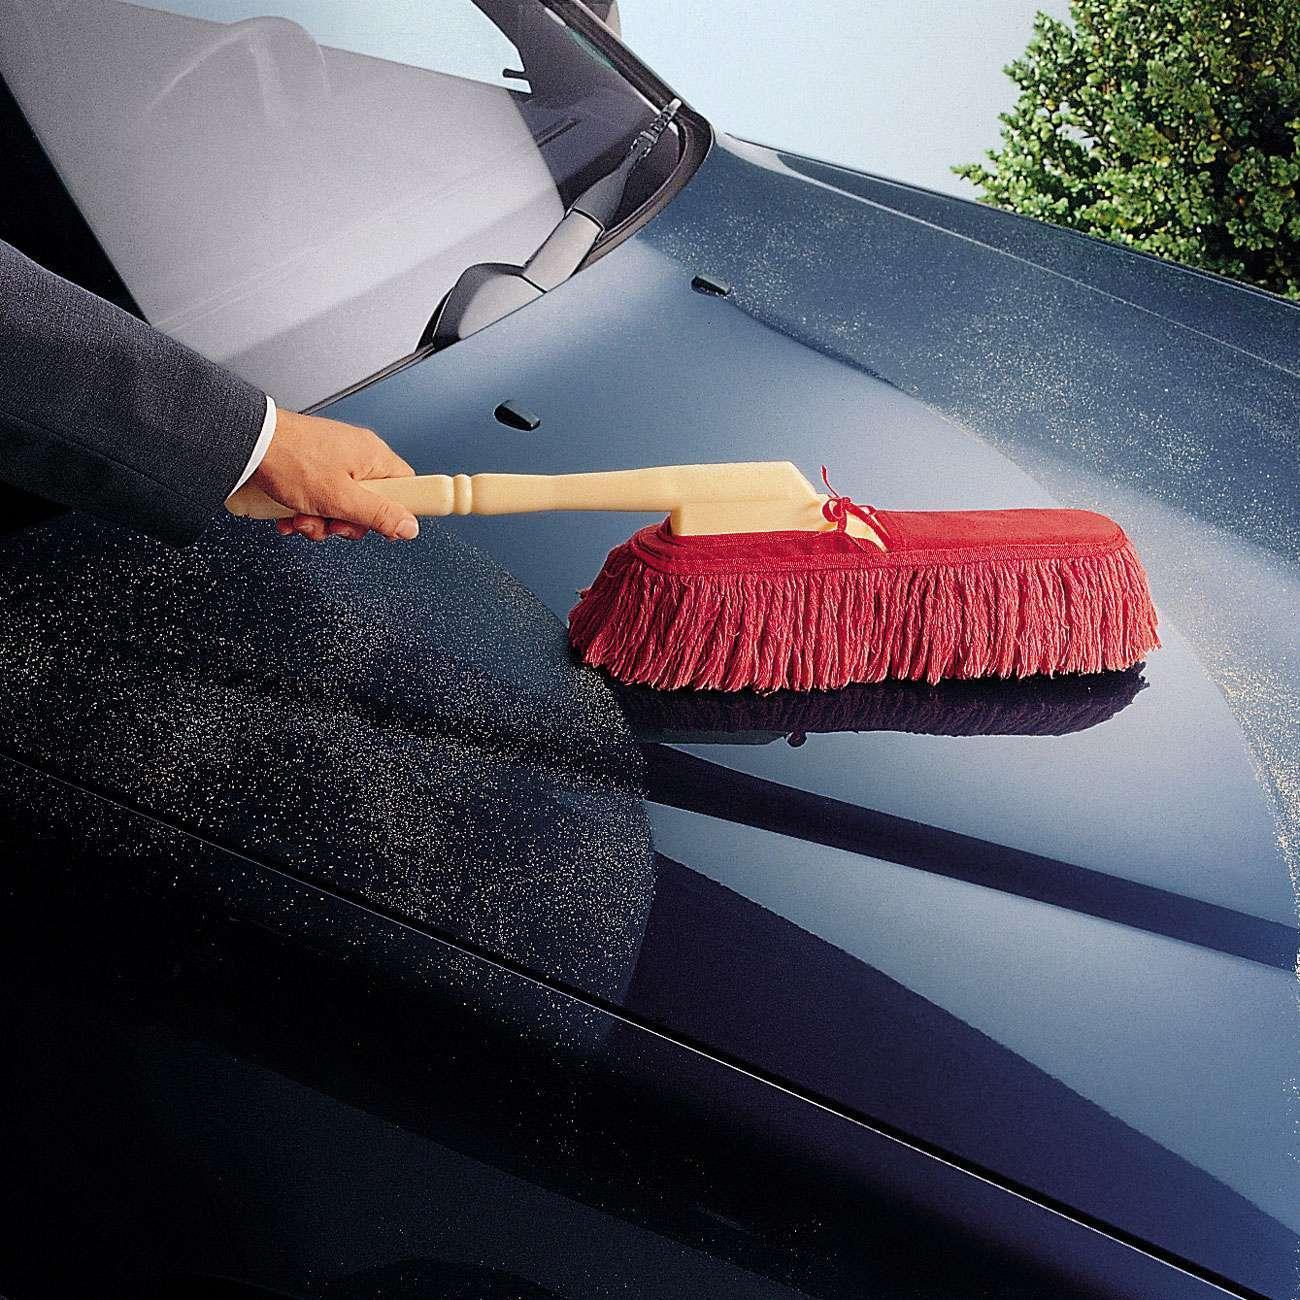 acheter original california car duster en ligne pas cher. Black Bedroom Furniture Sets. Home Design Ideas